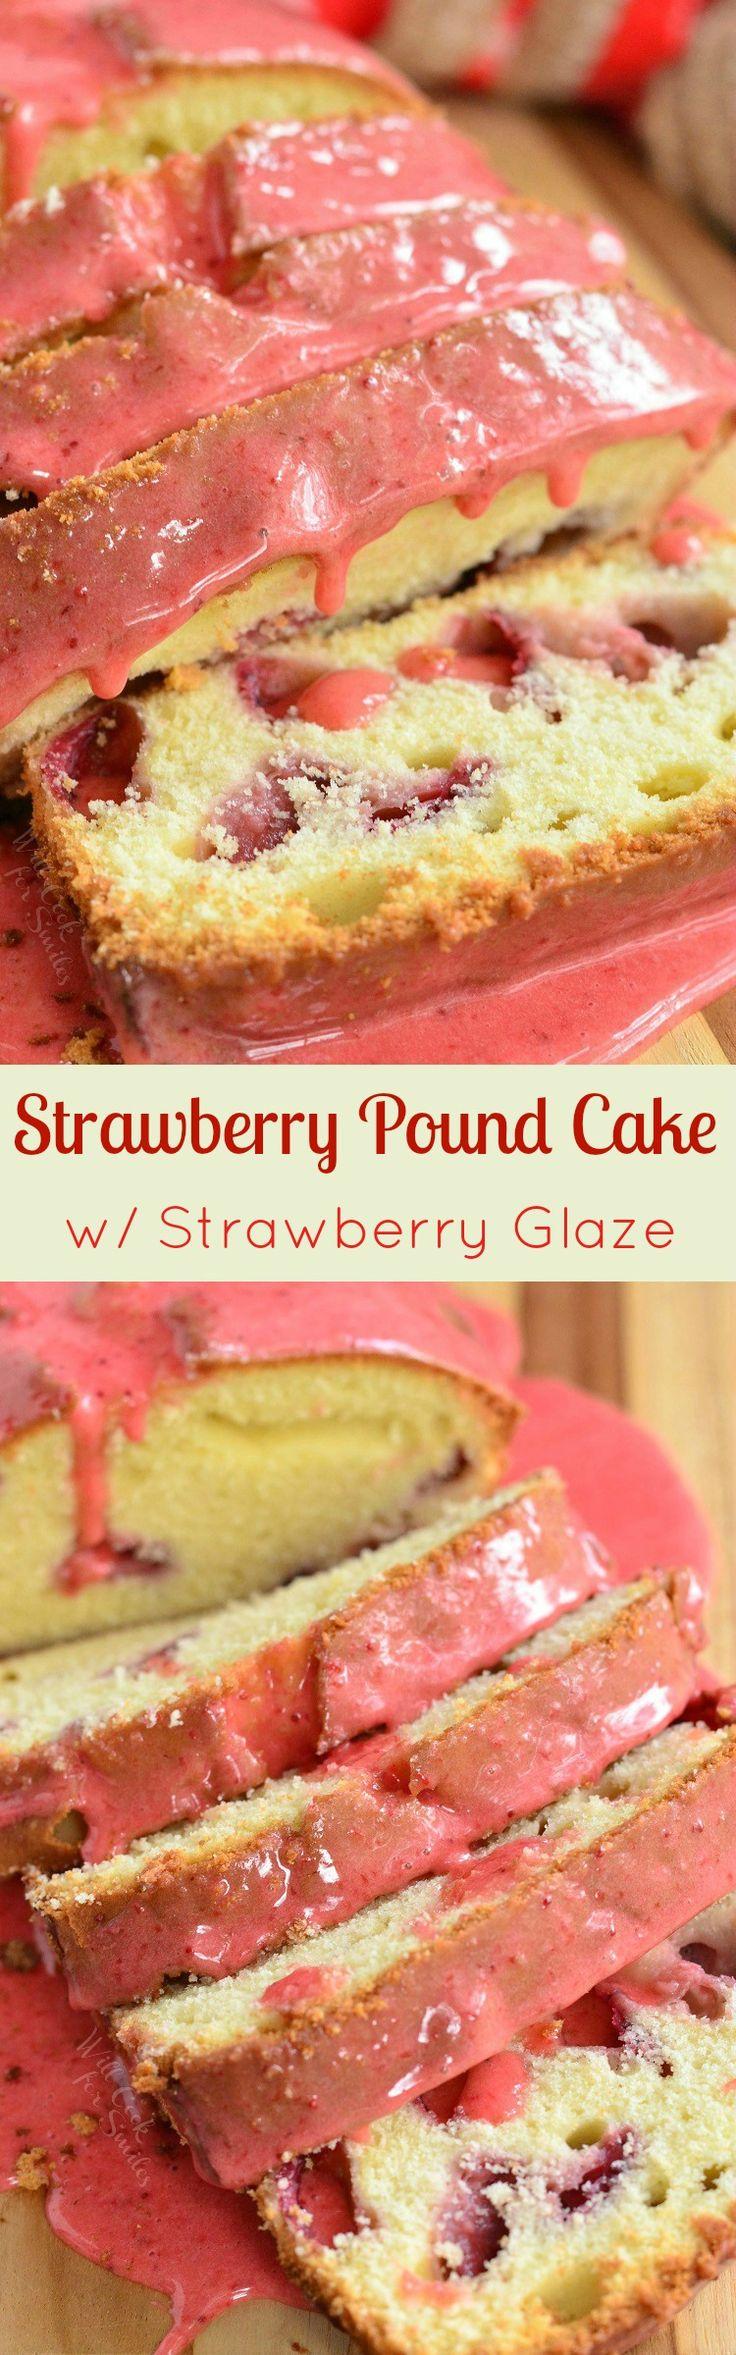 Glazed Strawberry Pound Cake. Soft, aromatic, and strawberry packed pound cake is a beautiful way to celebrate a sweet holiday.